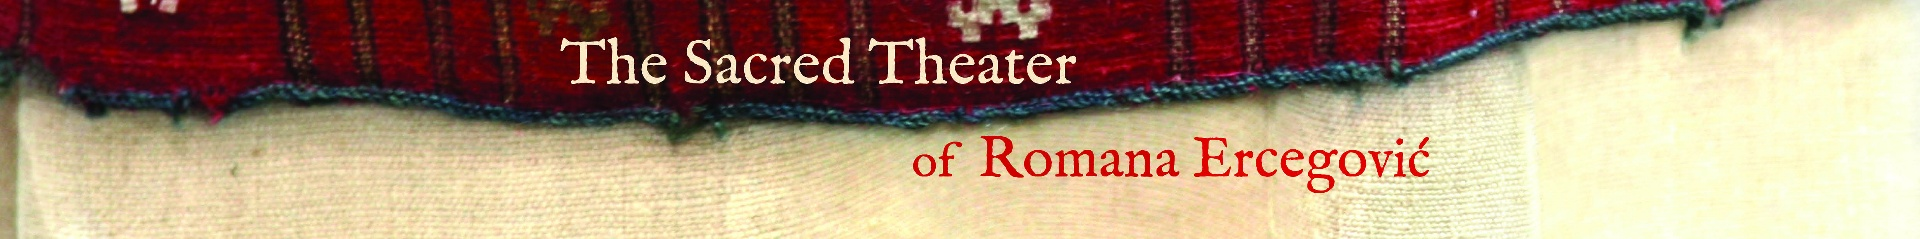 Ritual Theater Soul of the Earth